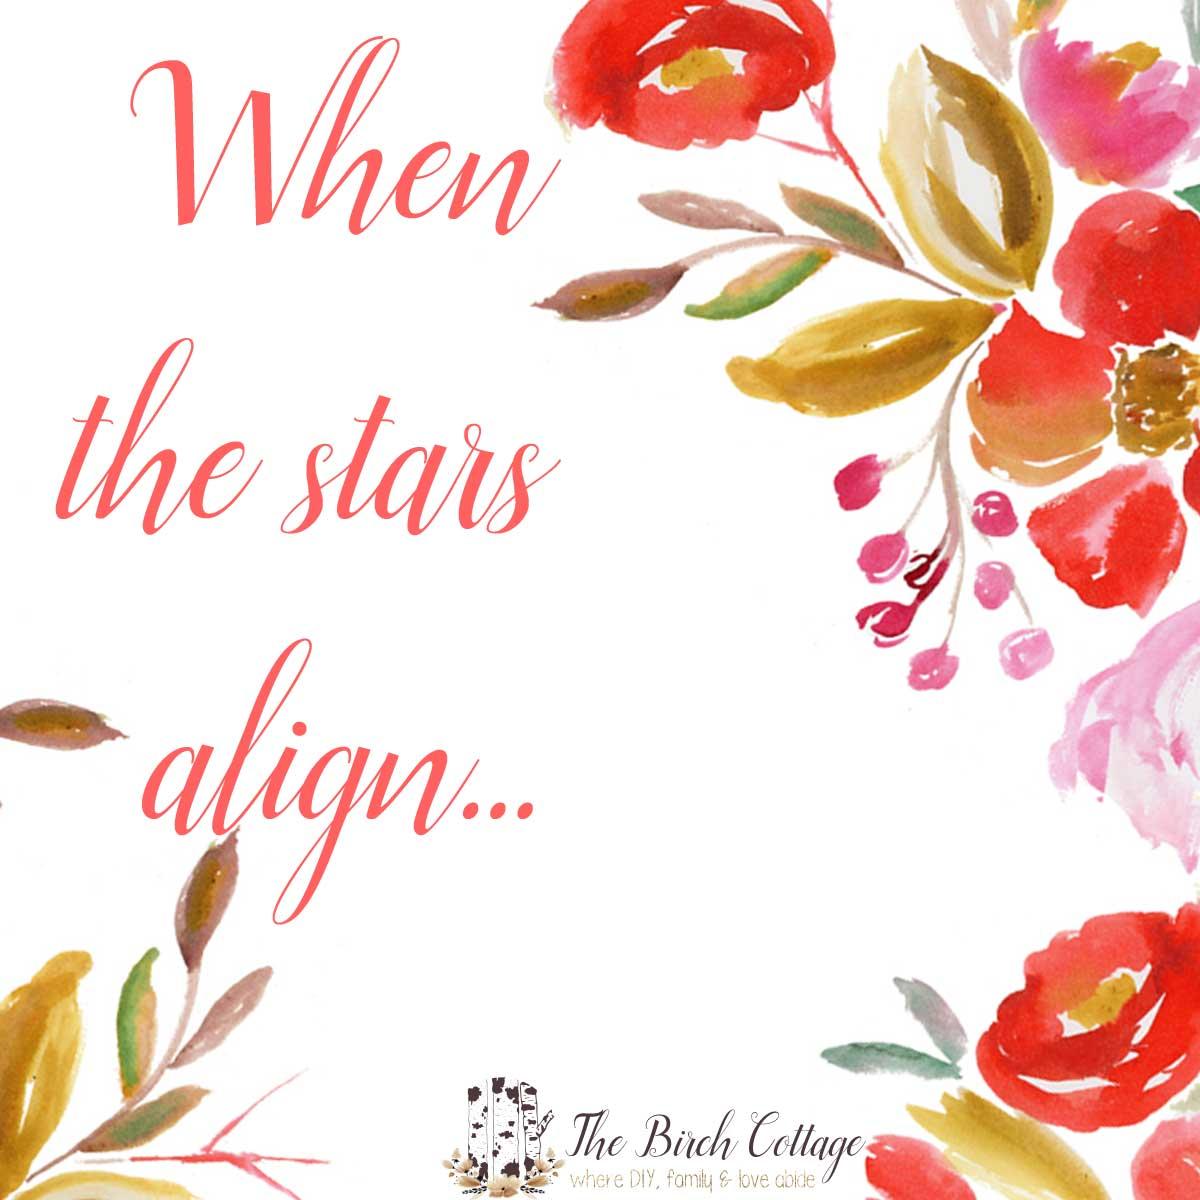 When the stars align...